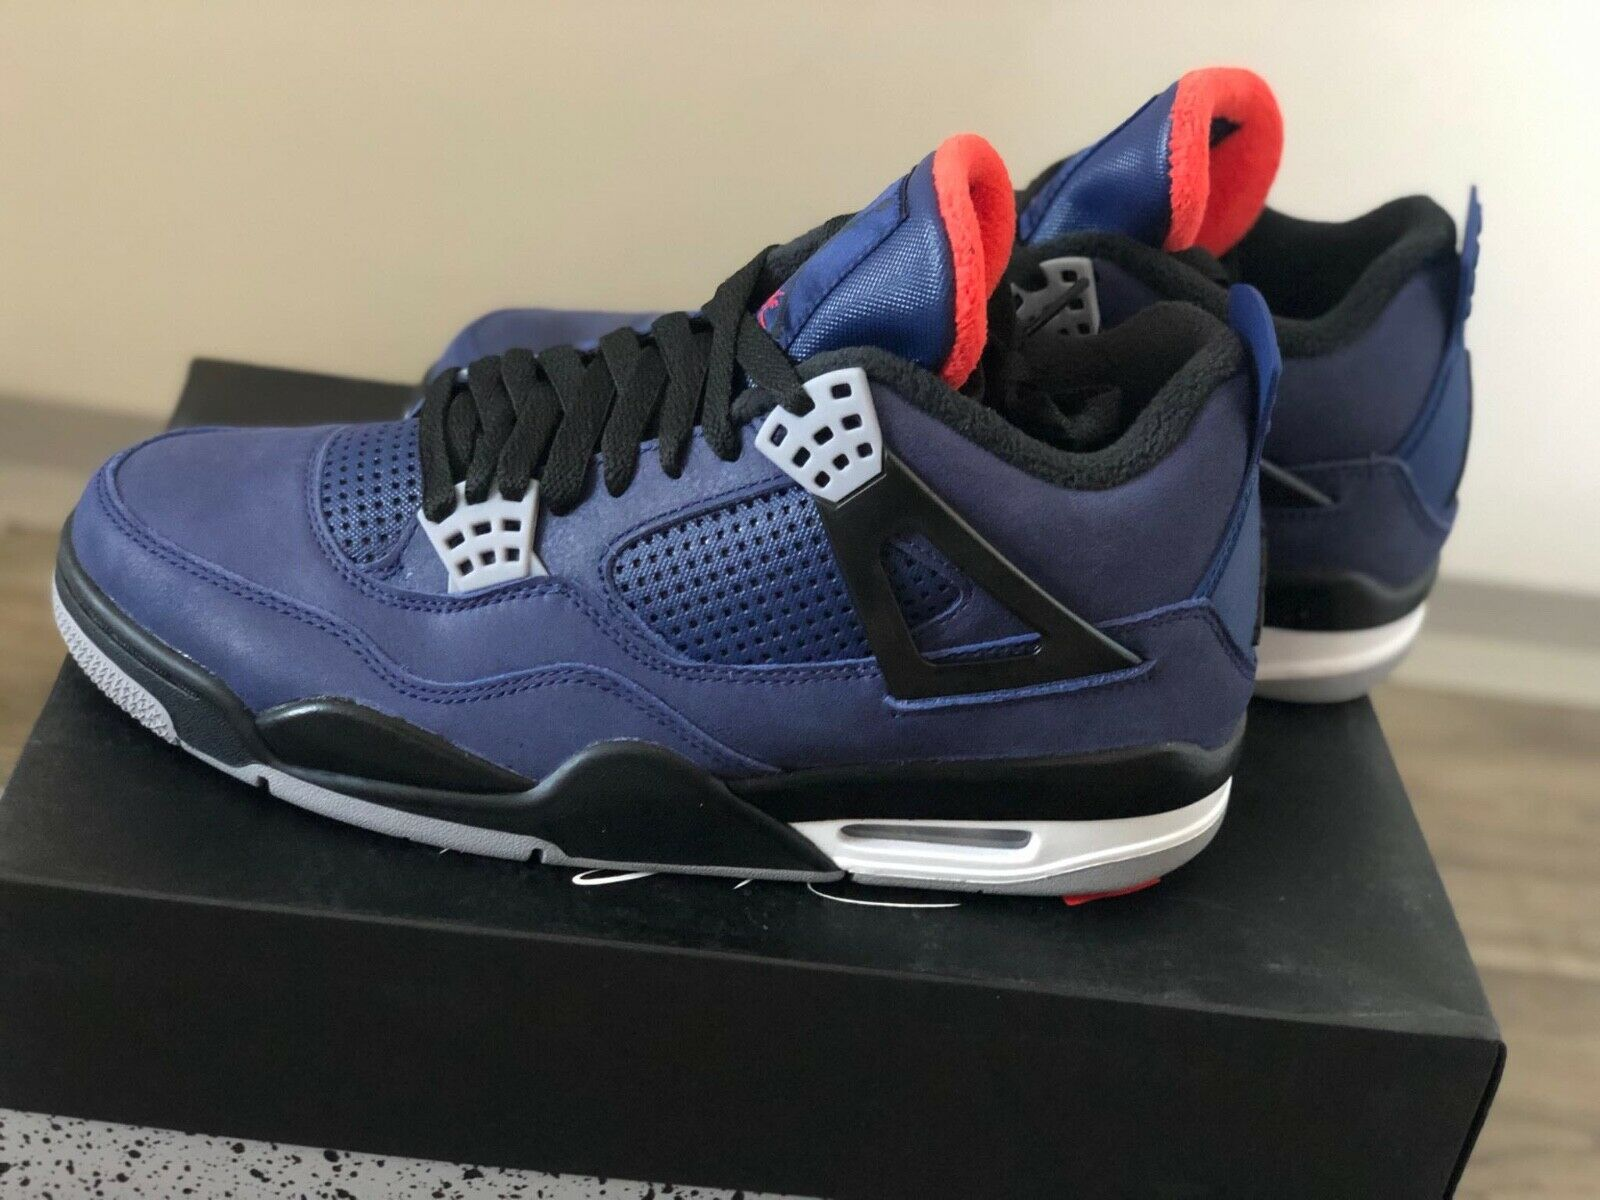 Jordan 4 Retro Winterized Loyal Blue